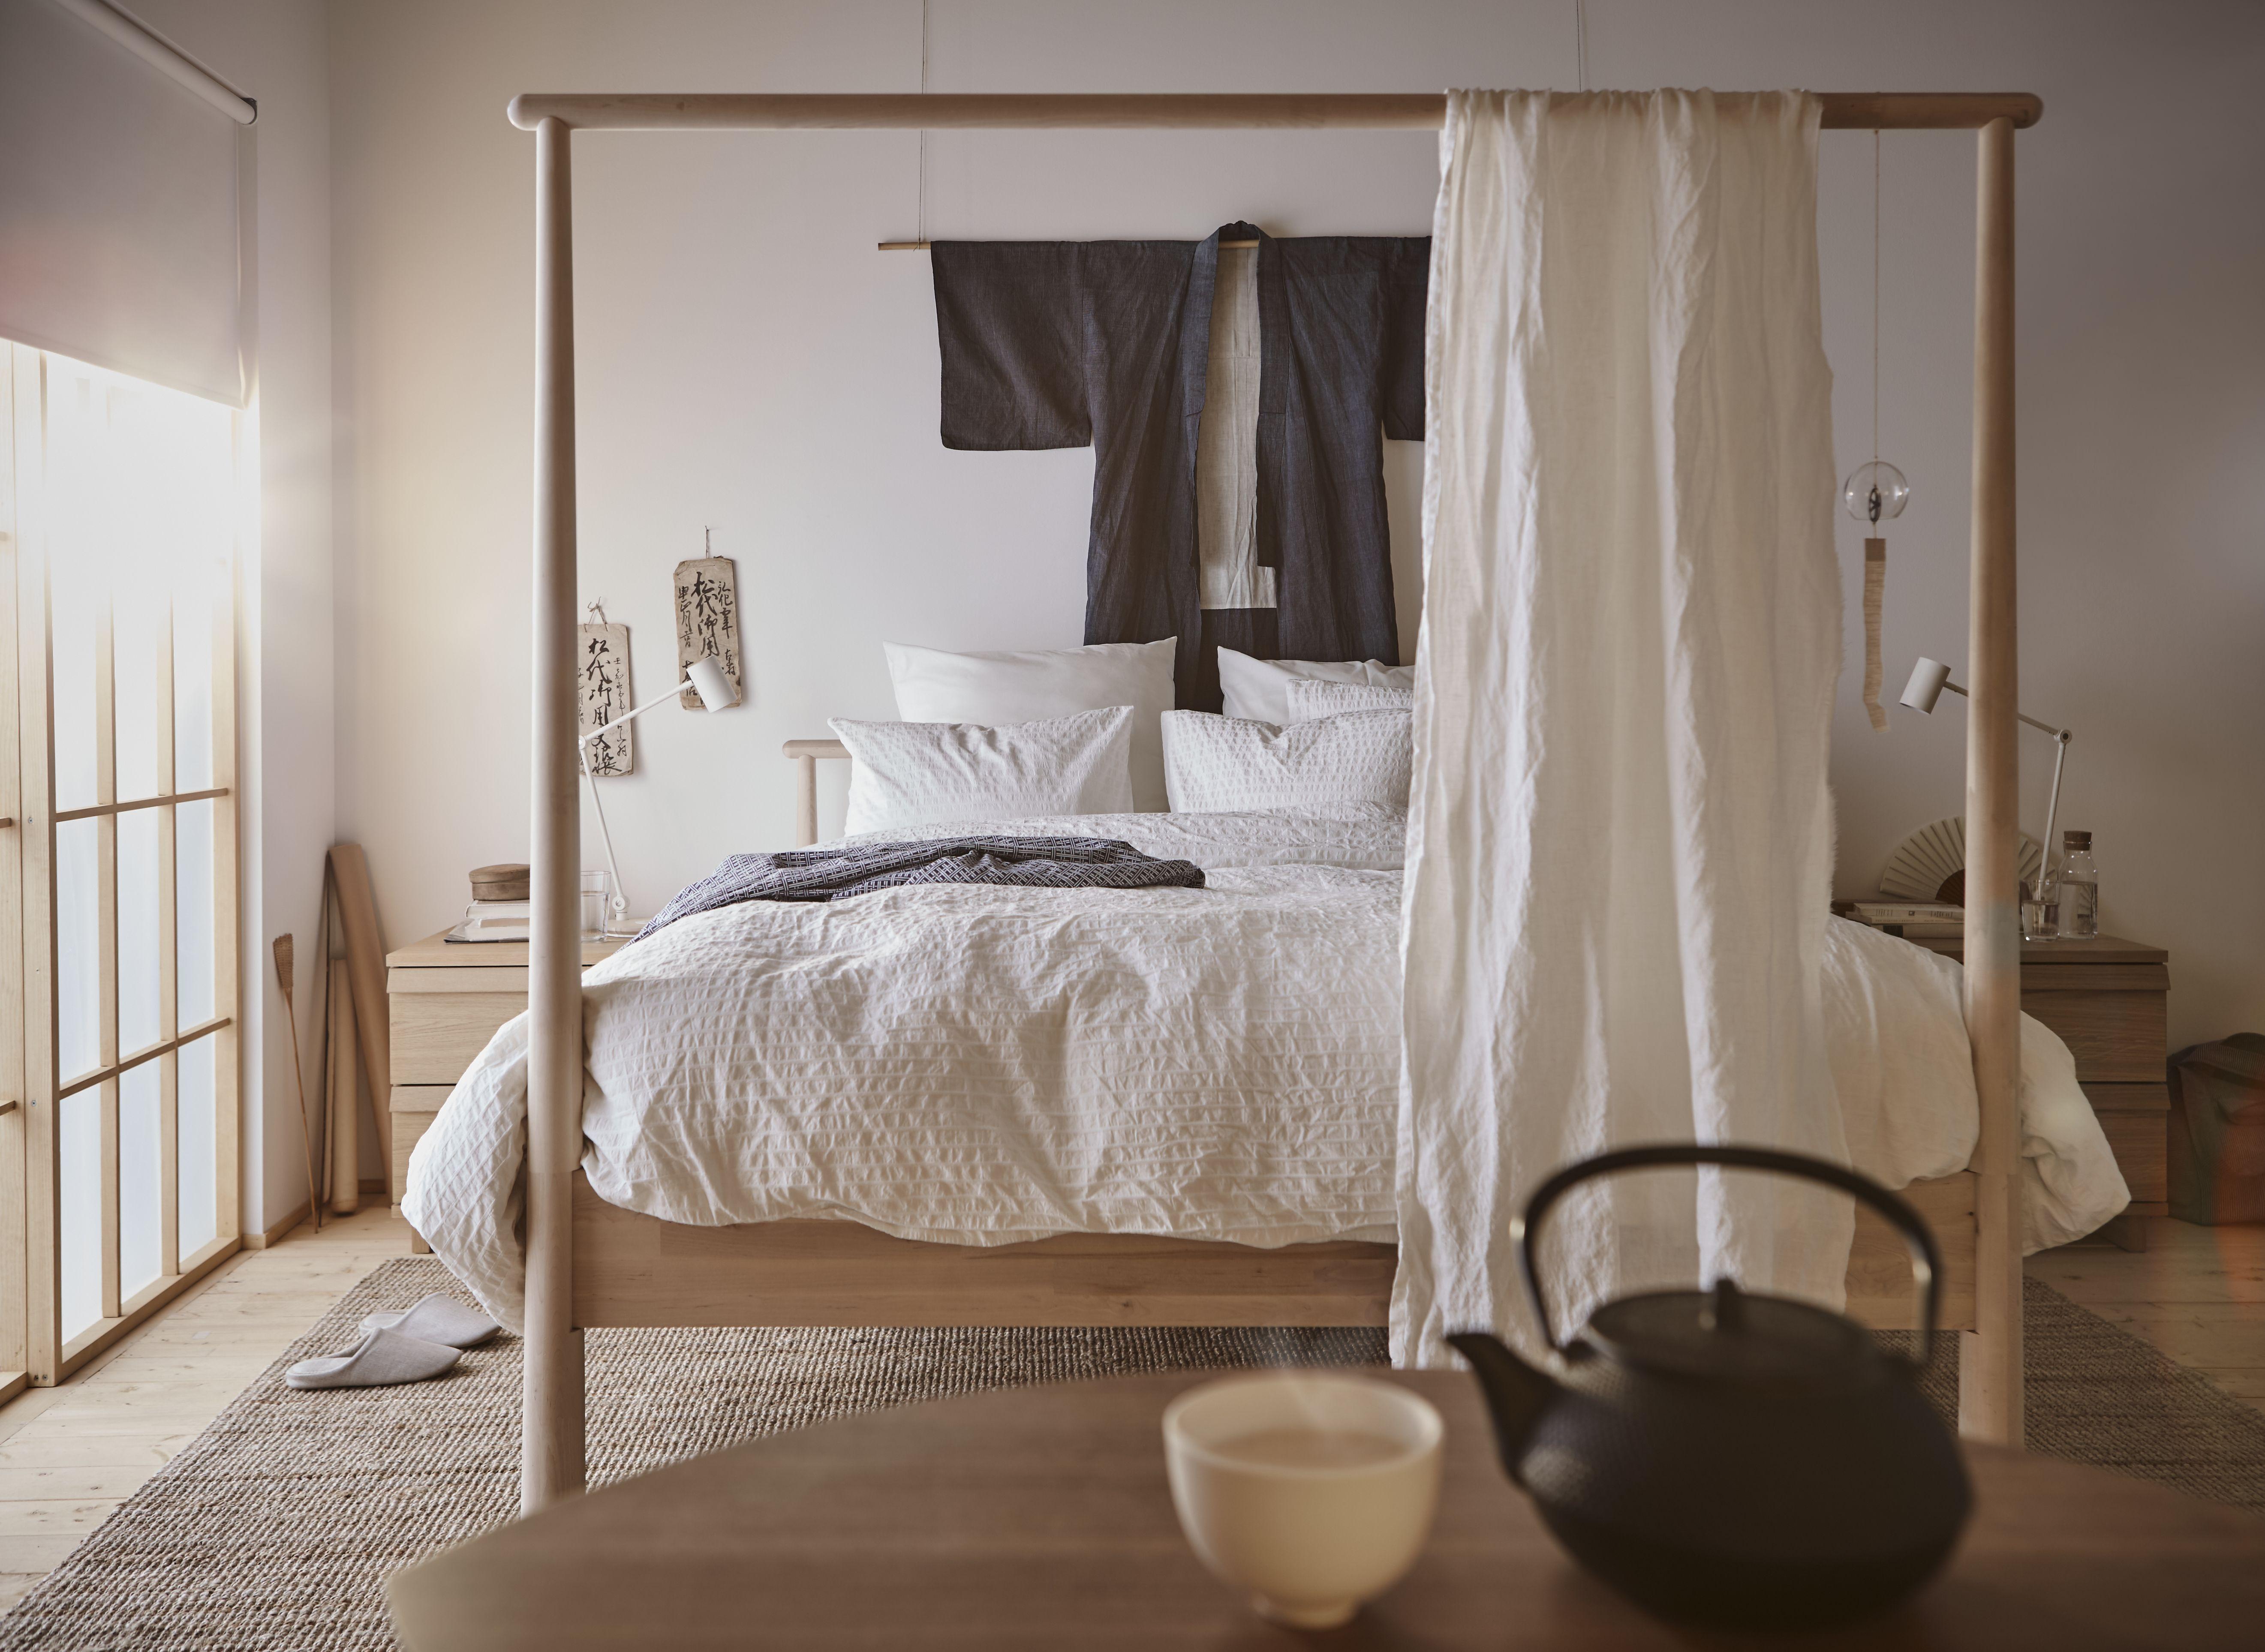 IKEA Switzerland - furnishings for your home  Ikea inspiration